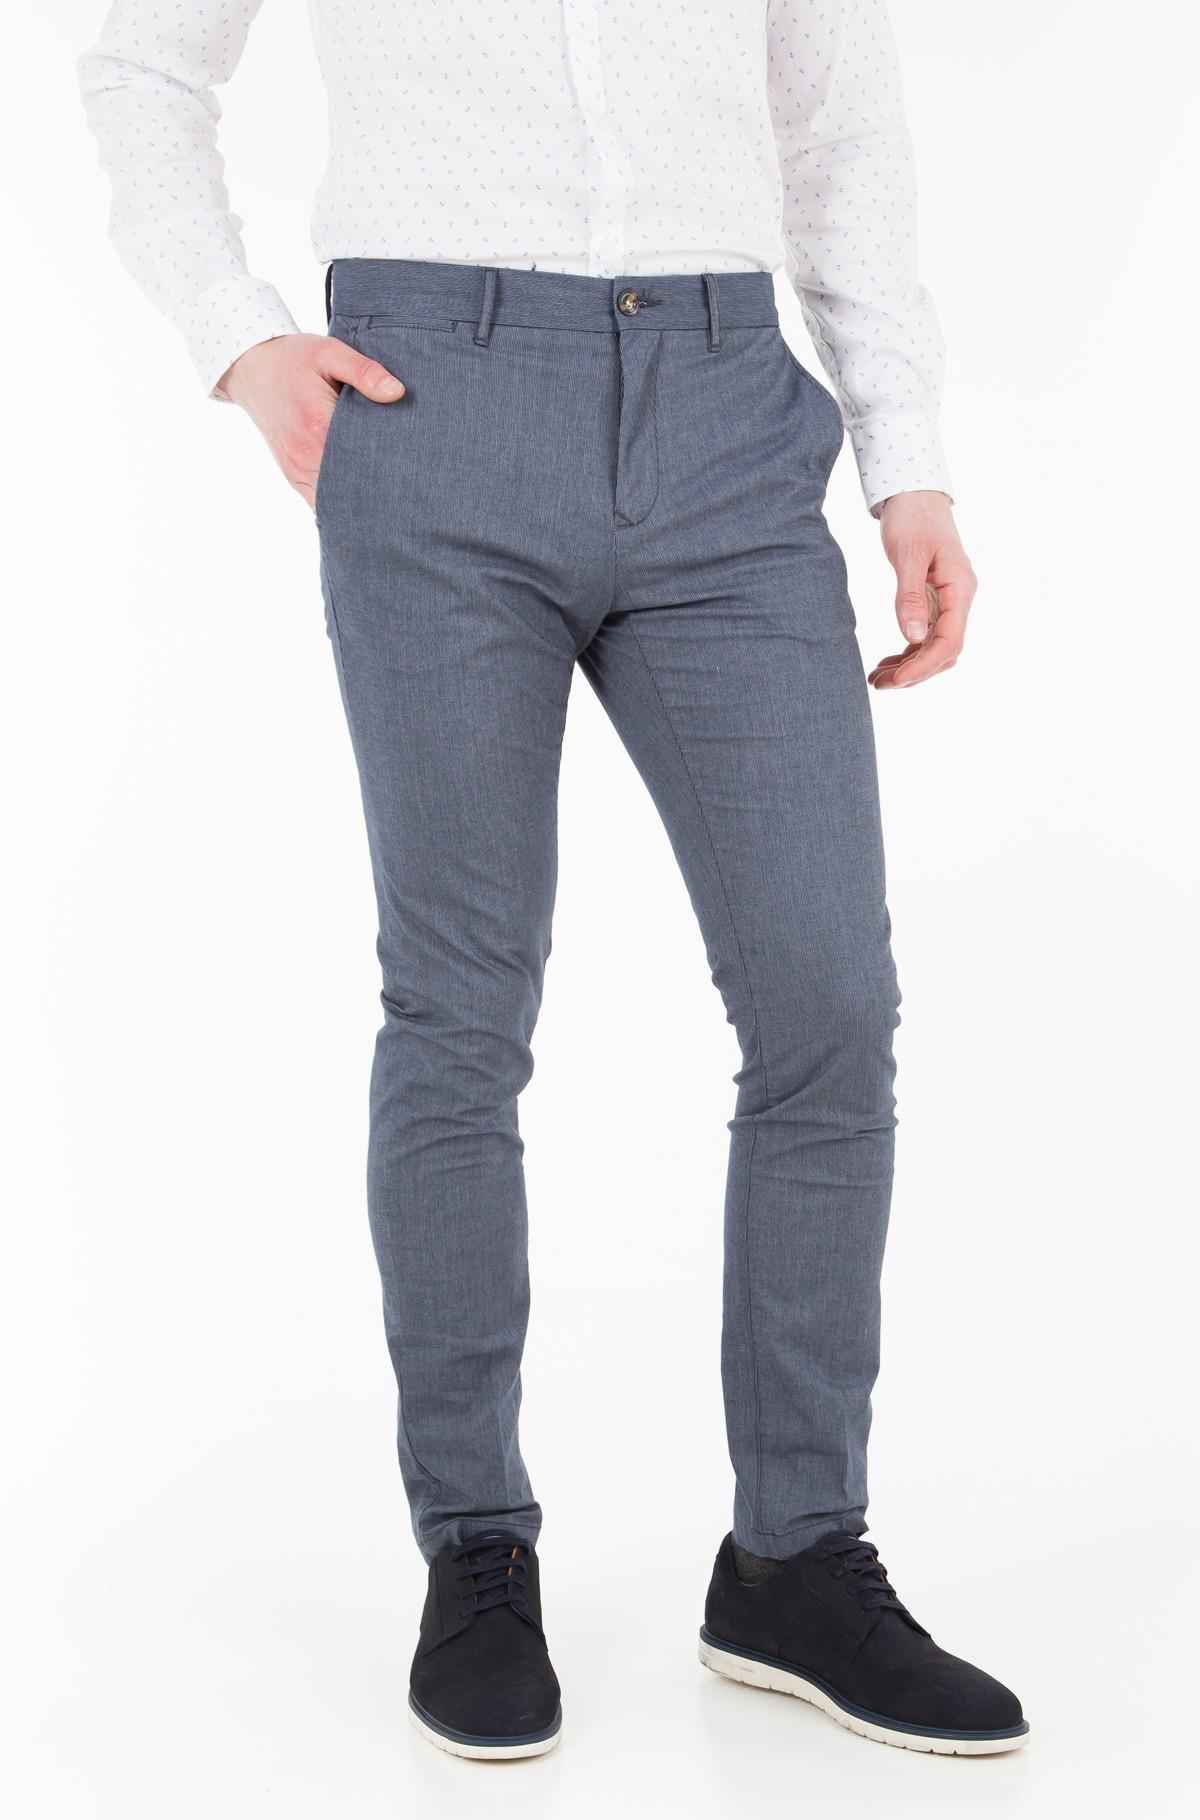 Trousers Denton Chino Str Lt Wt Yd Stripe-full-1